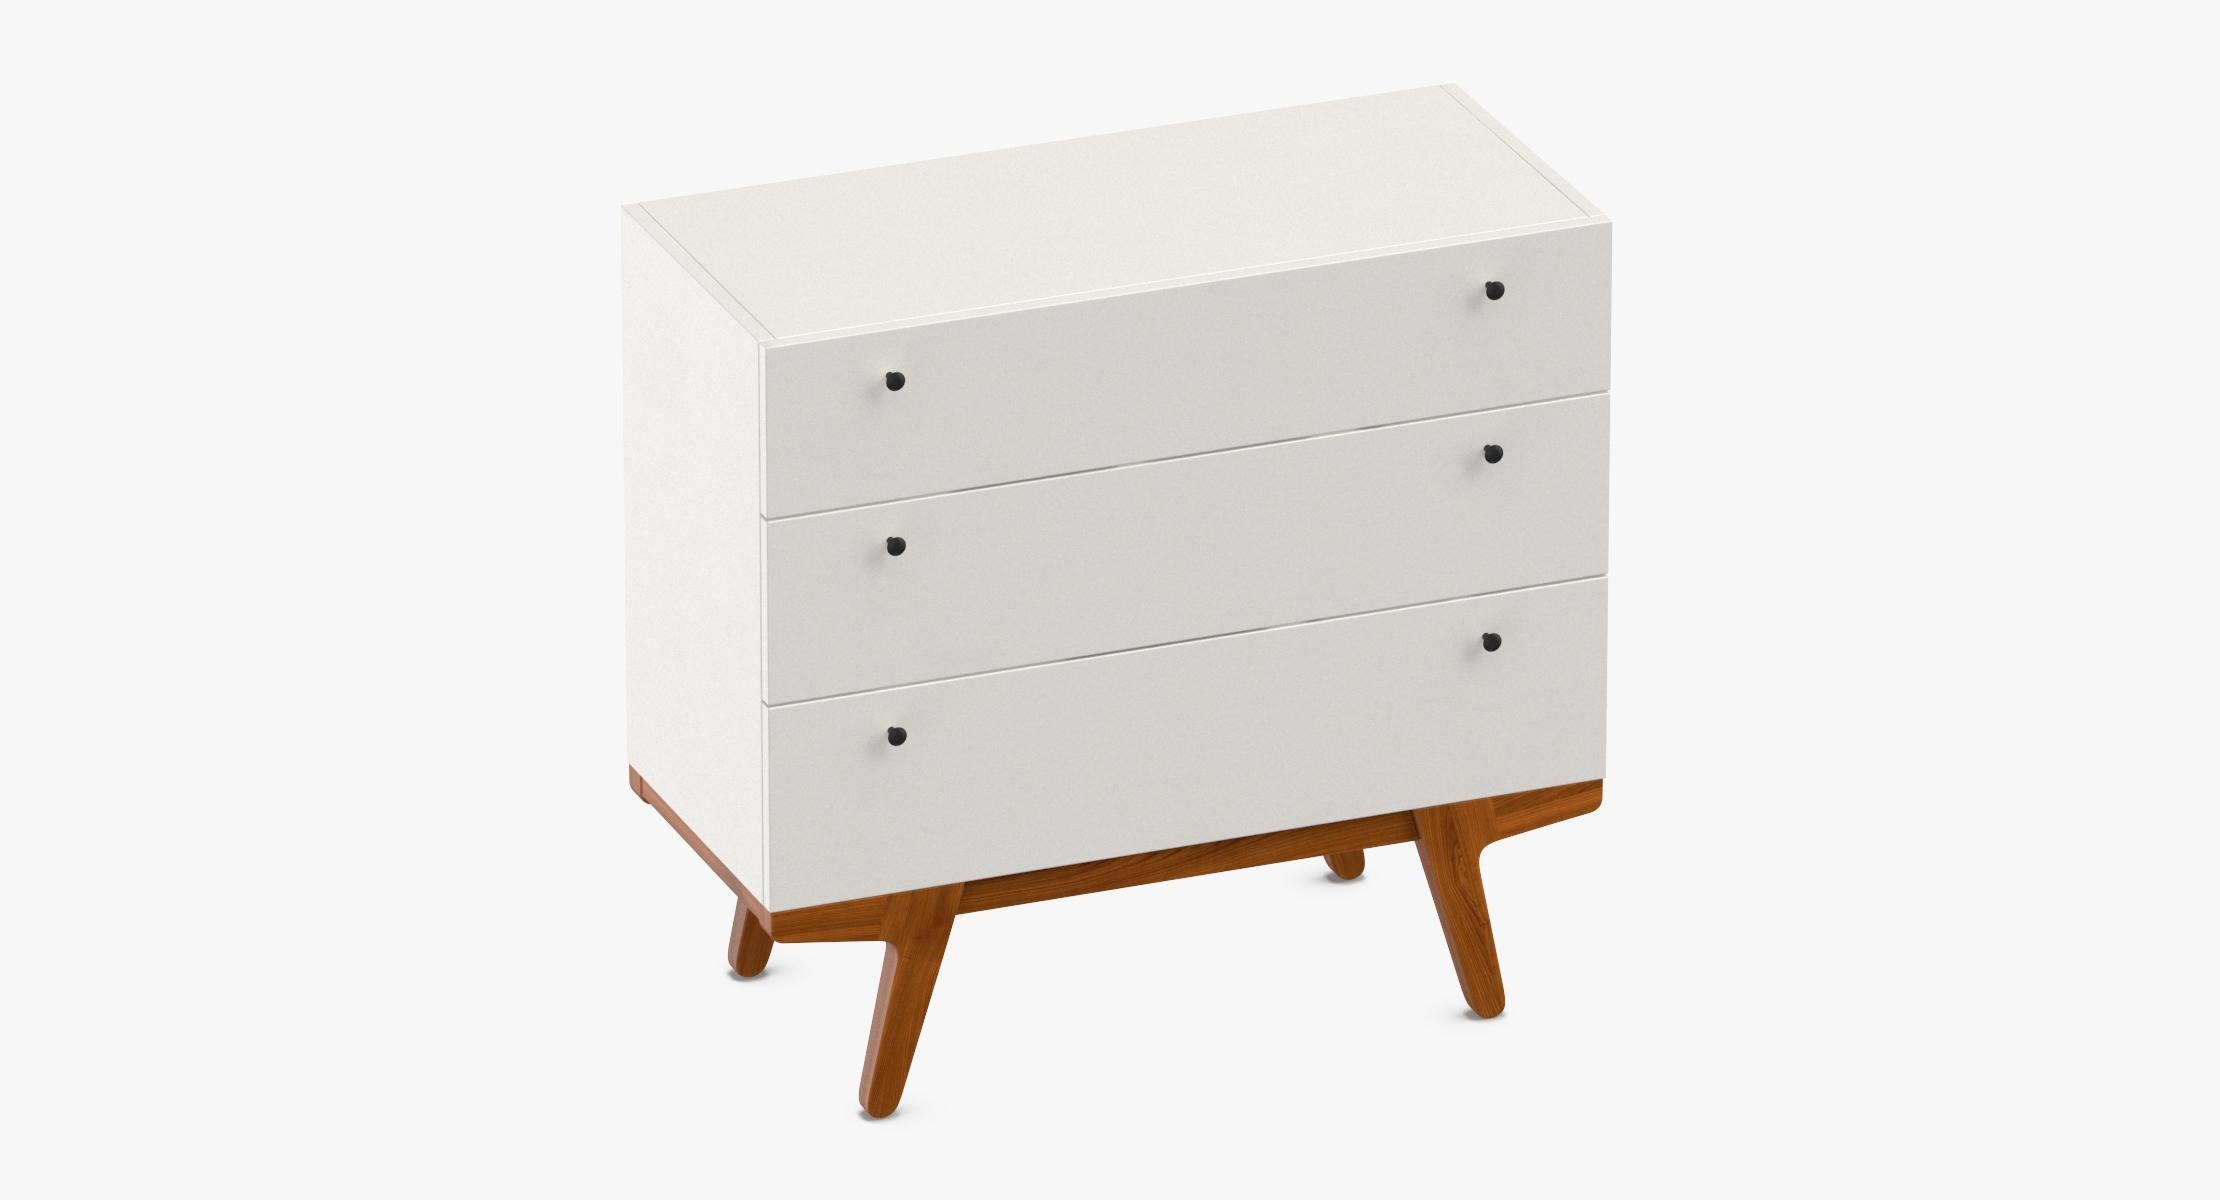 Mid-Century Modern Dresser - reel 1